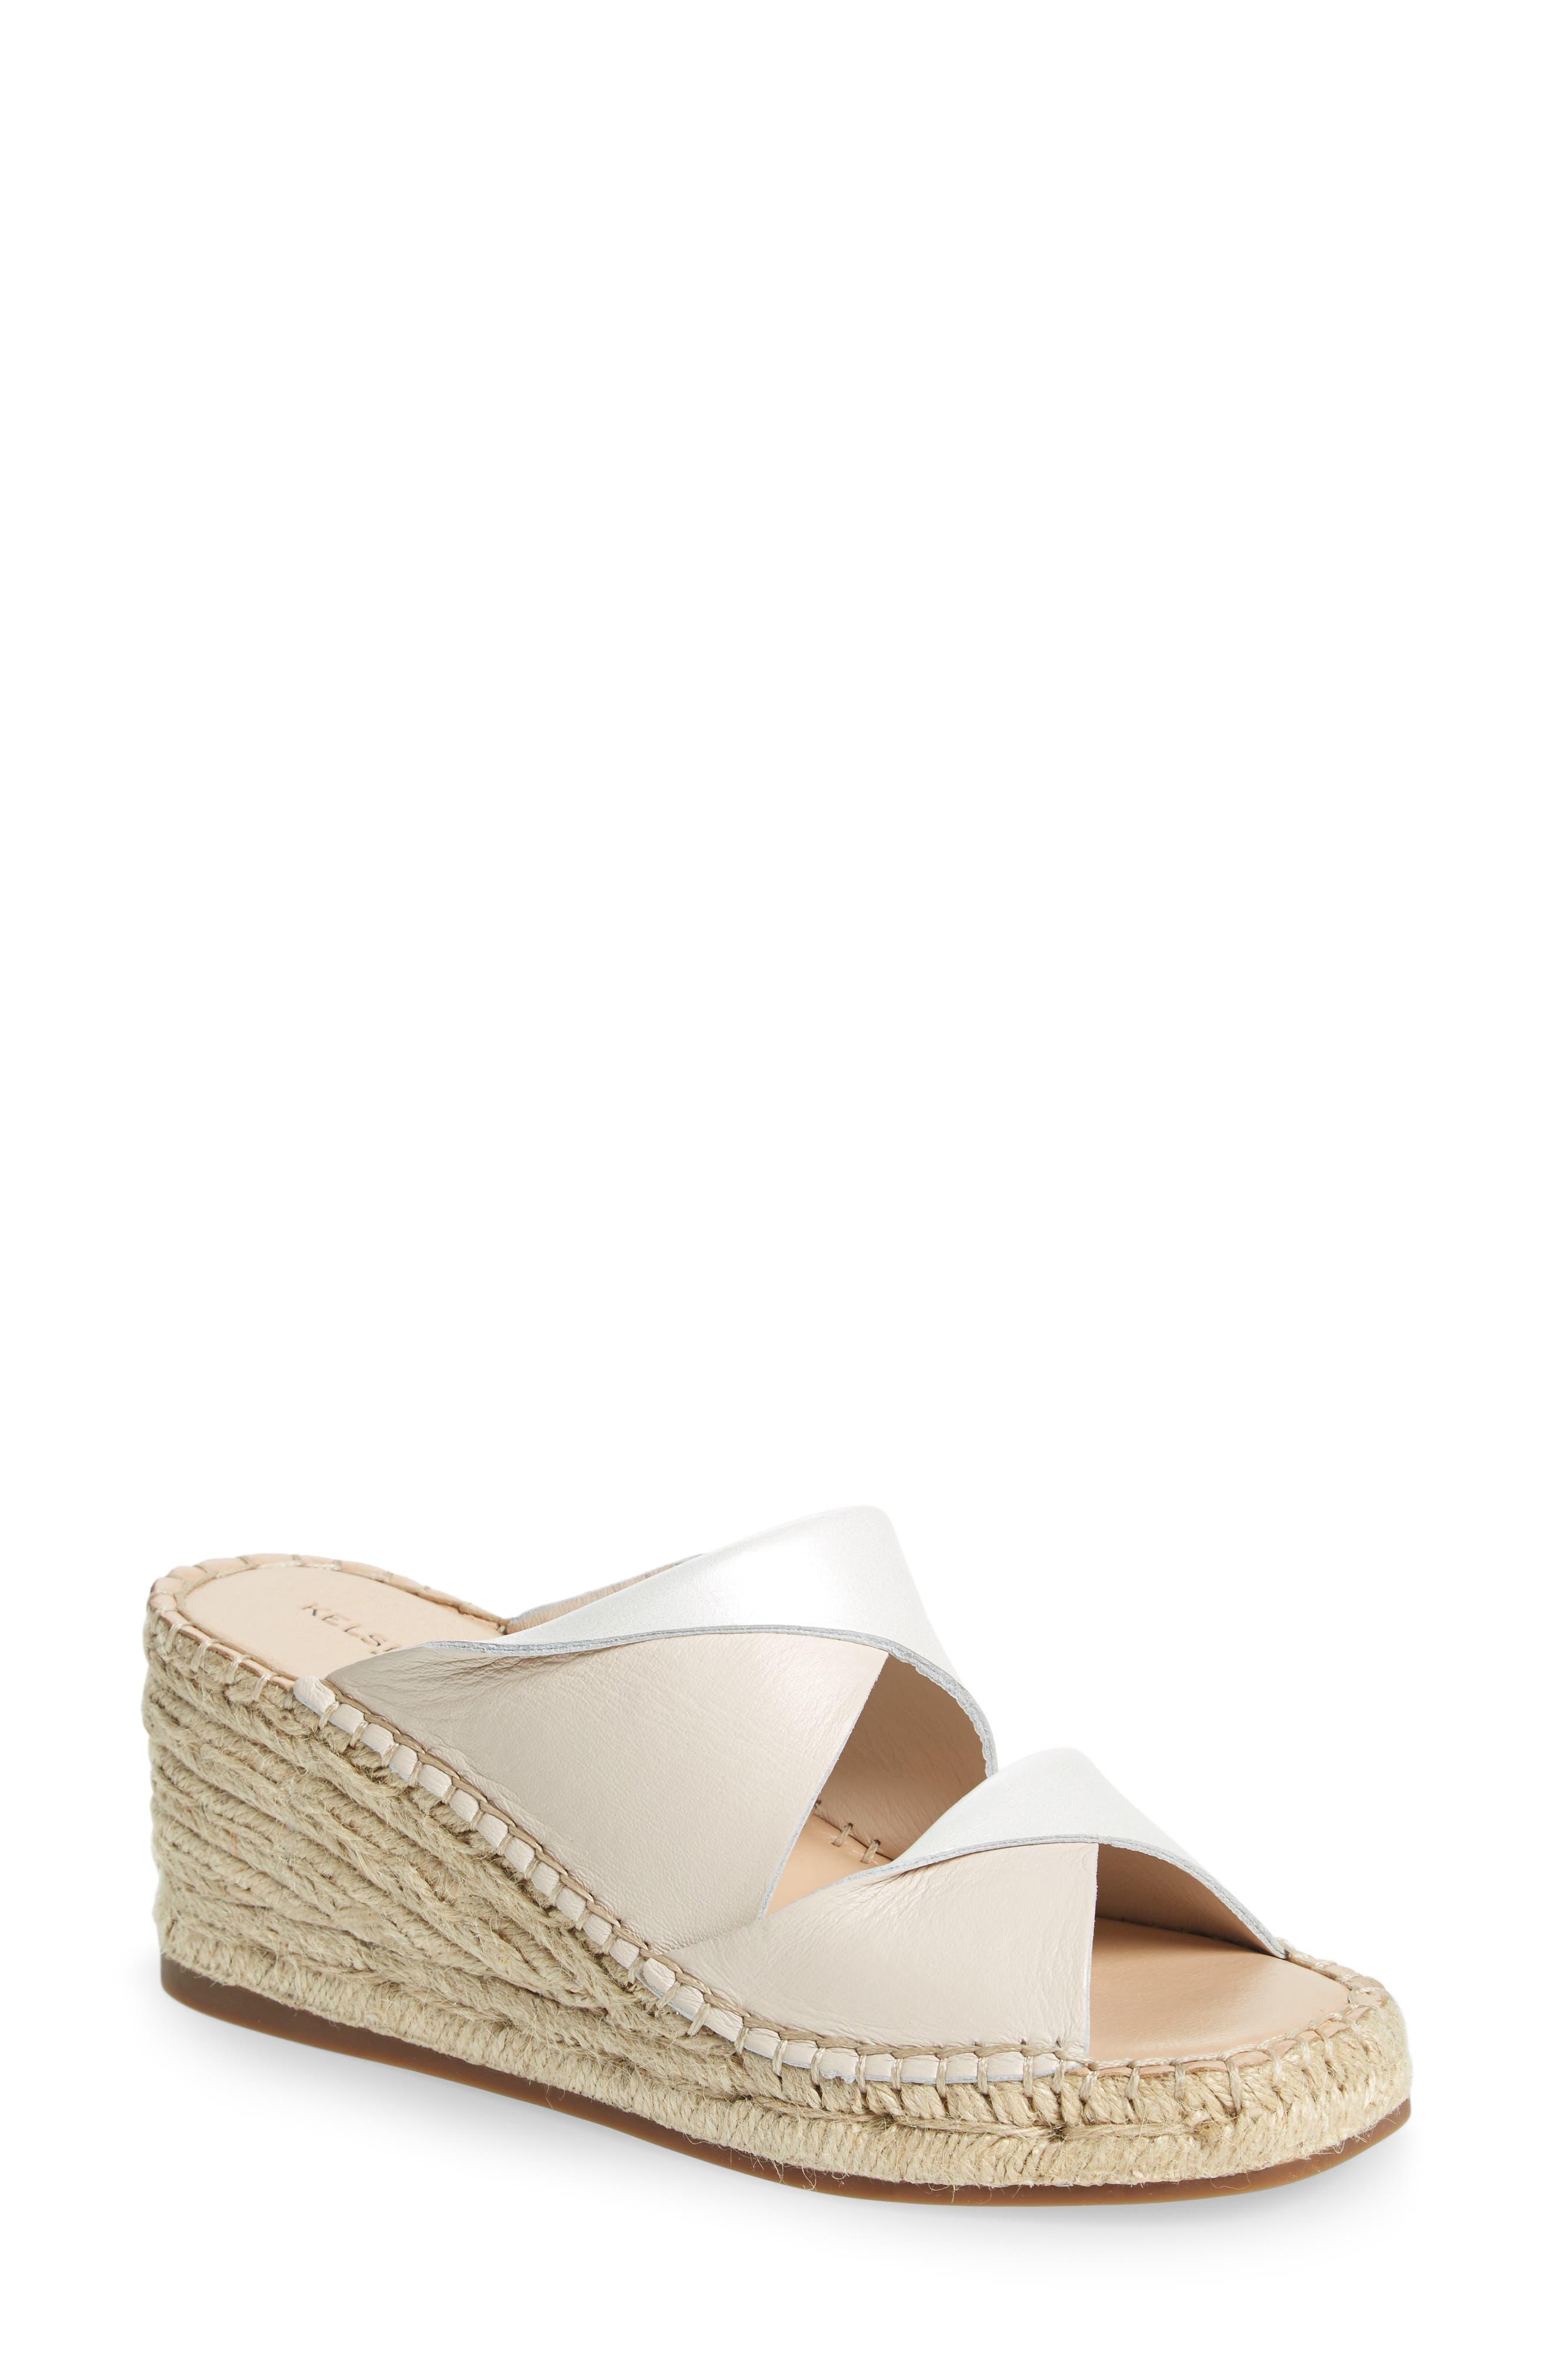 Kelsi Dagger Brooklyn Inwood Wedge Sandal (Women)